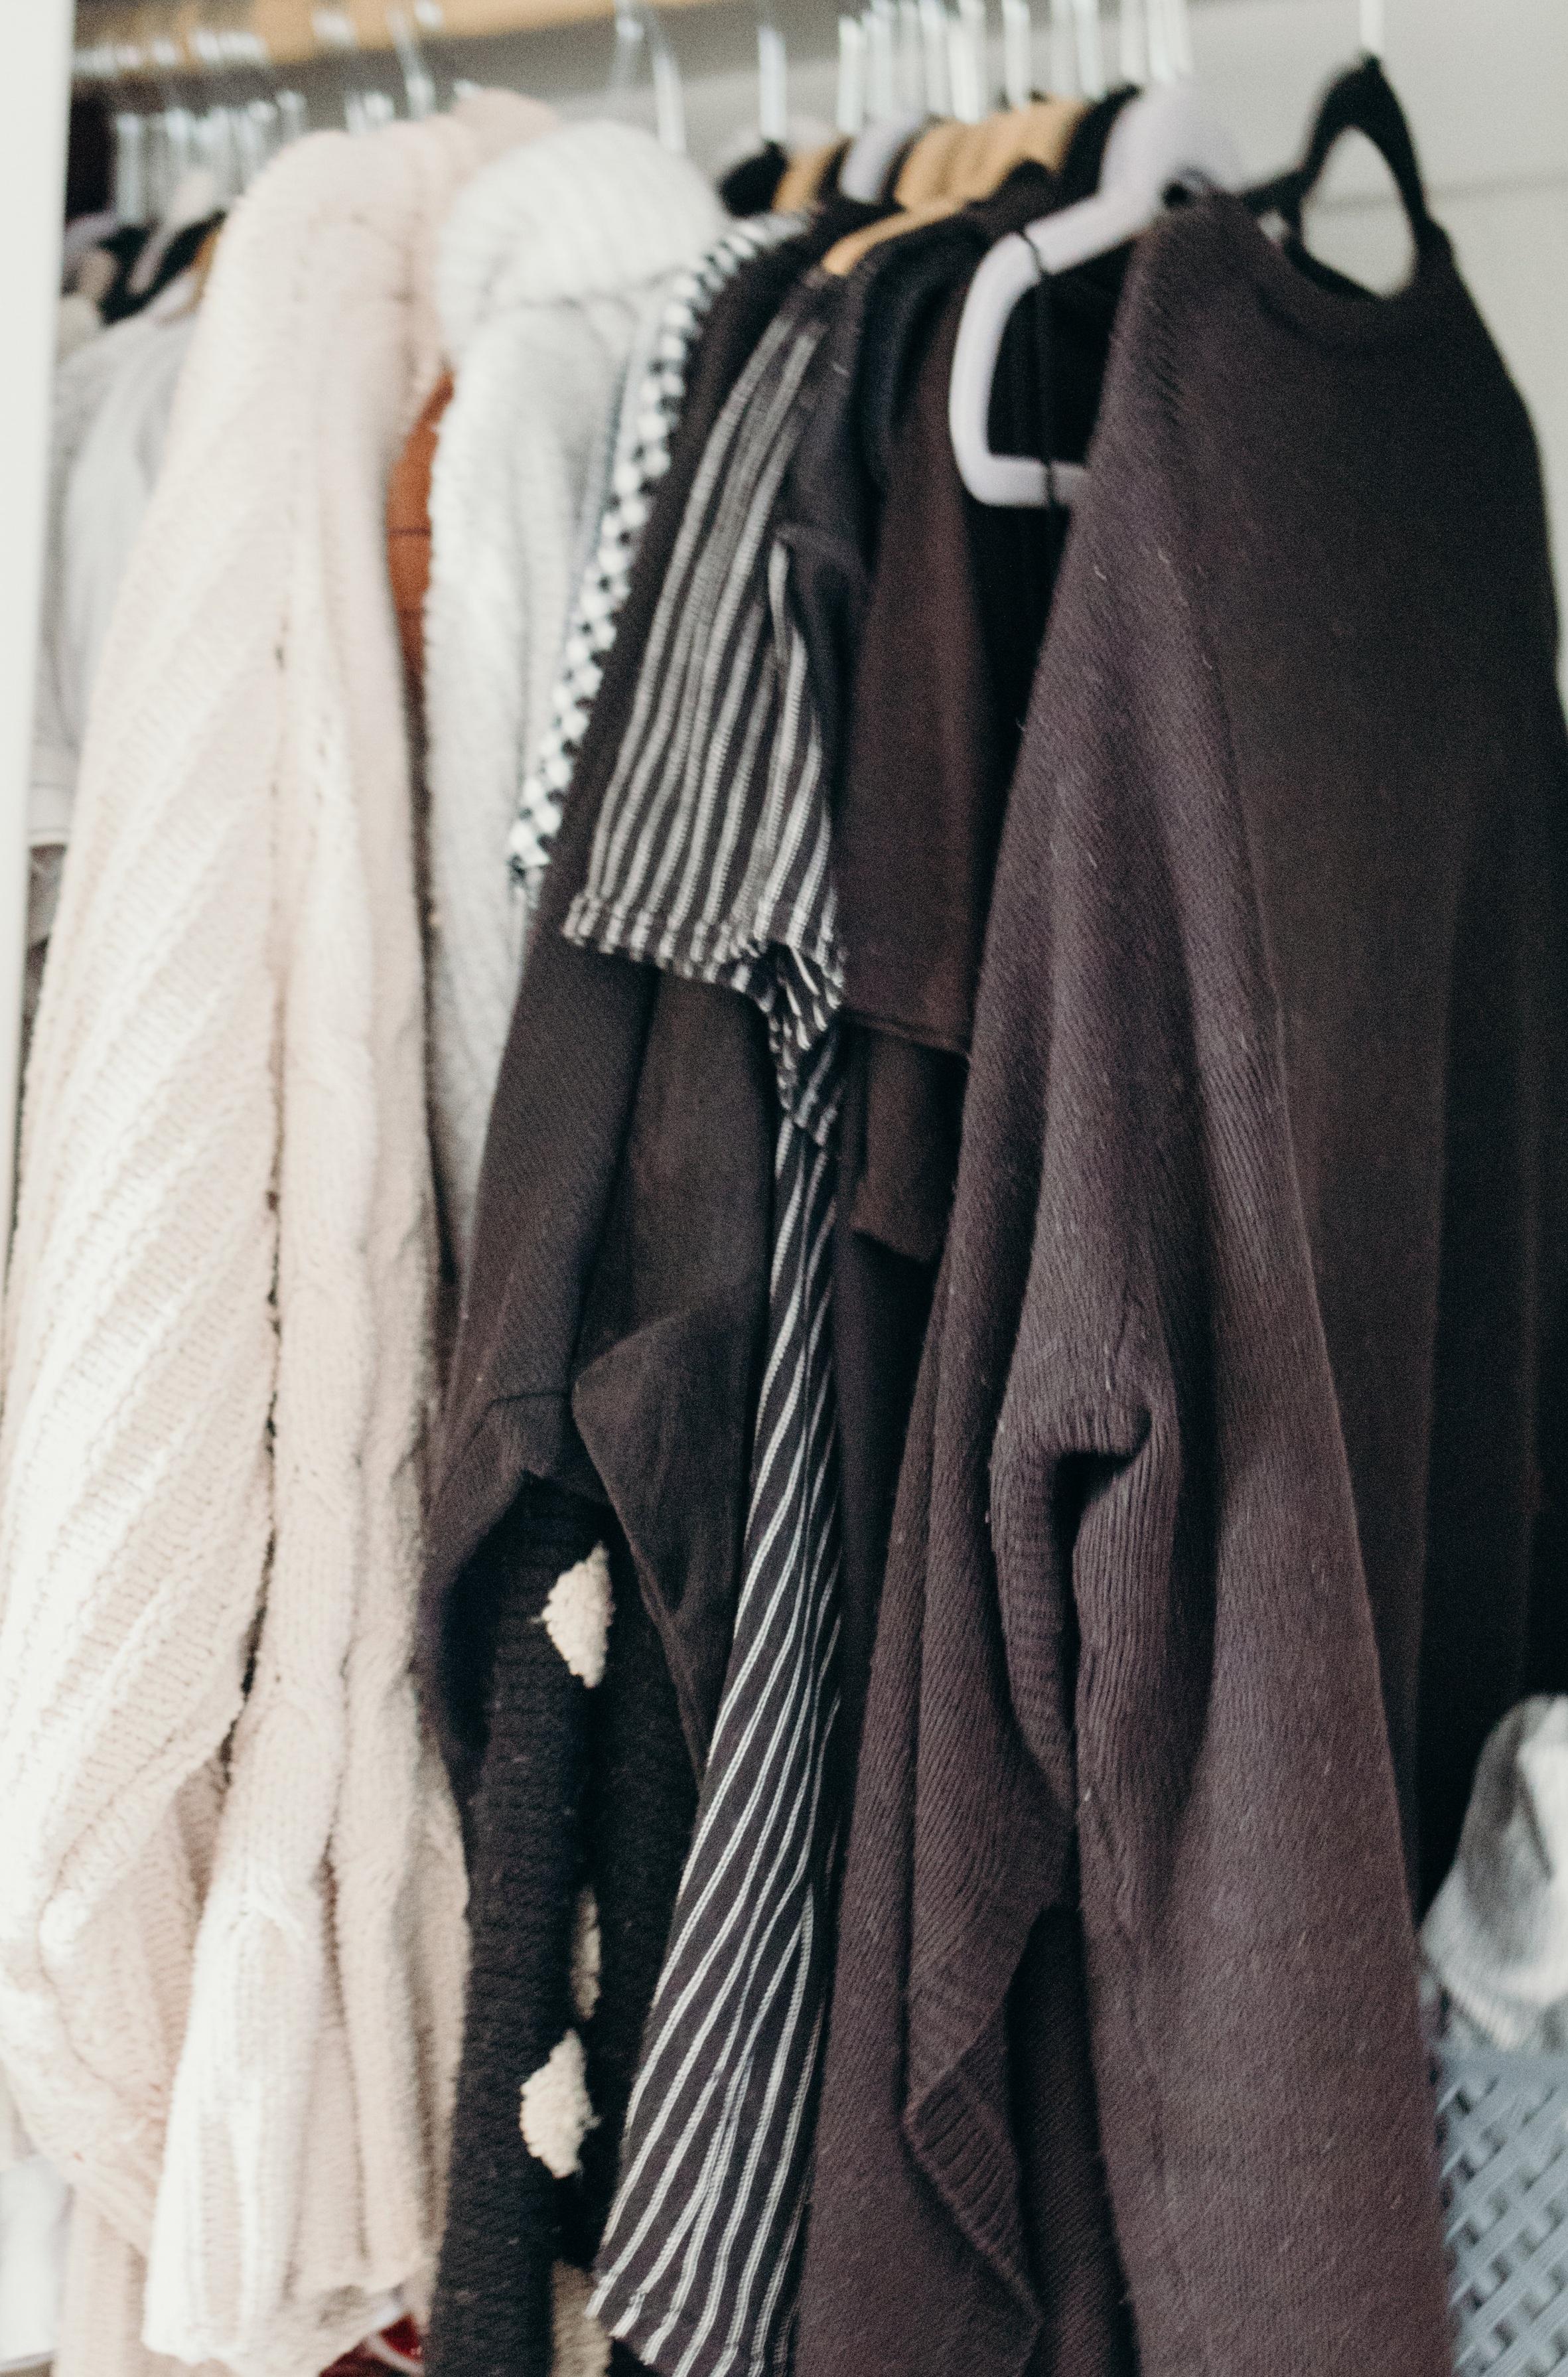 Marie Kondo Tidying Method | The Simplistic Chic